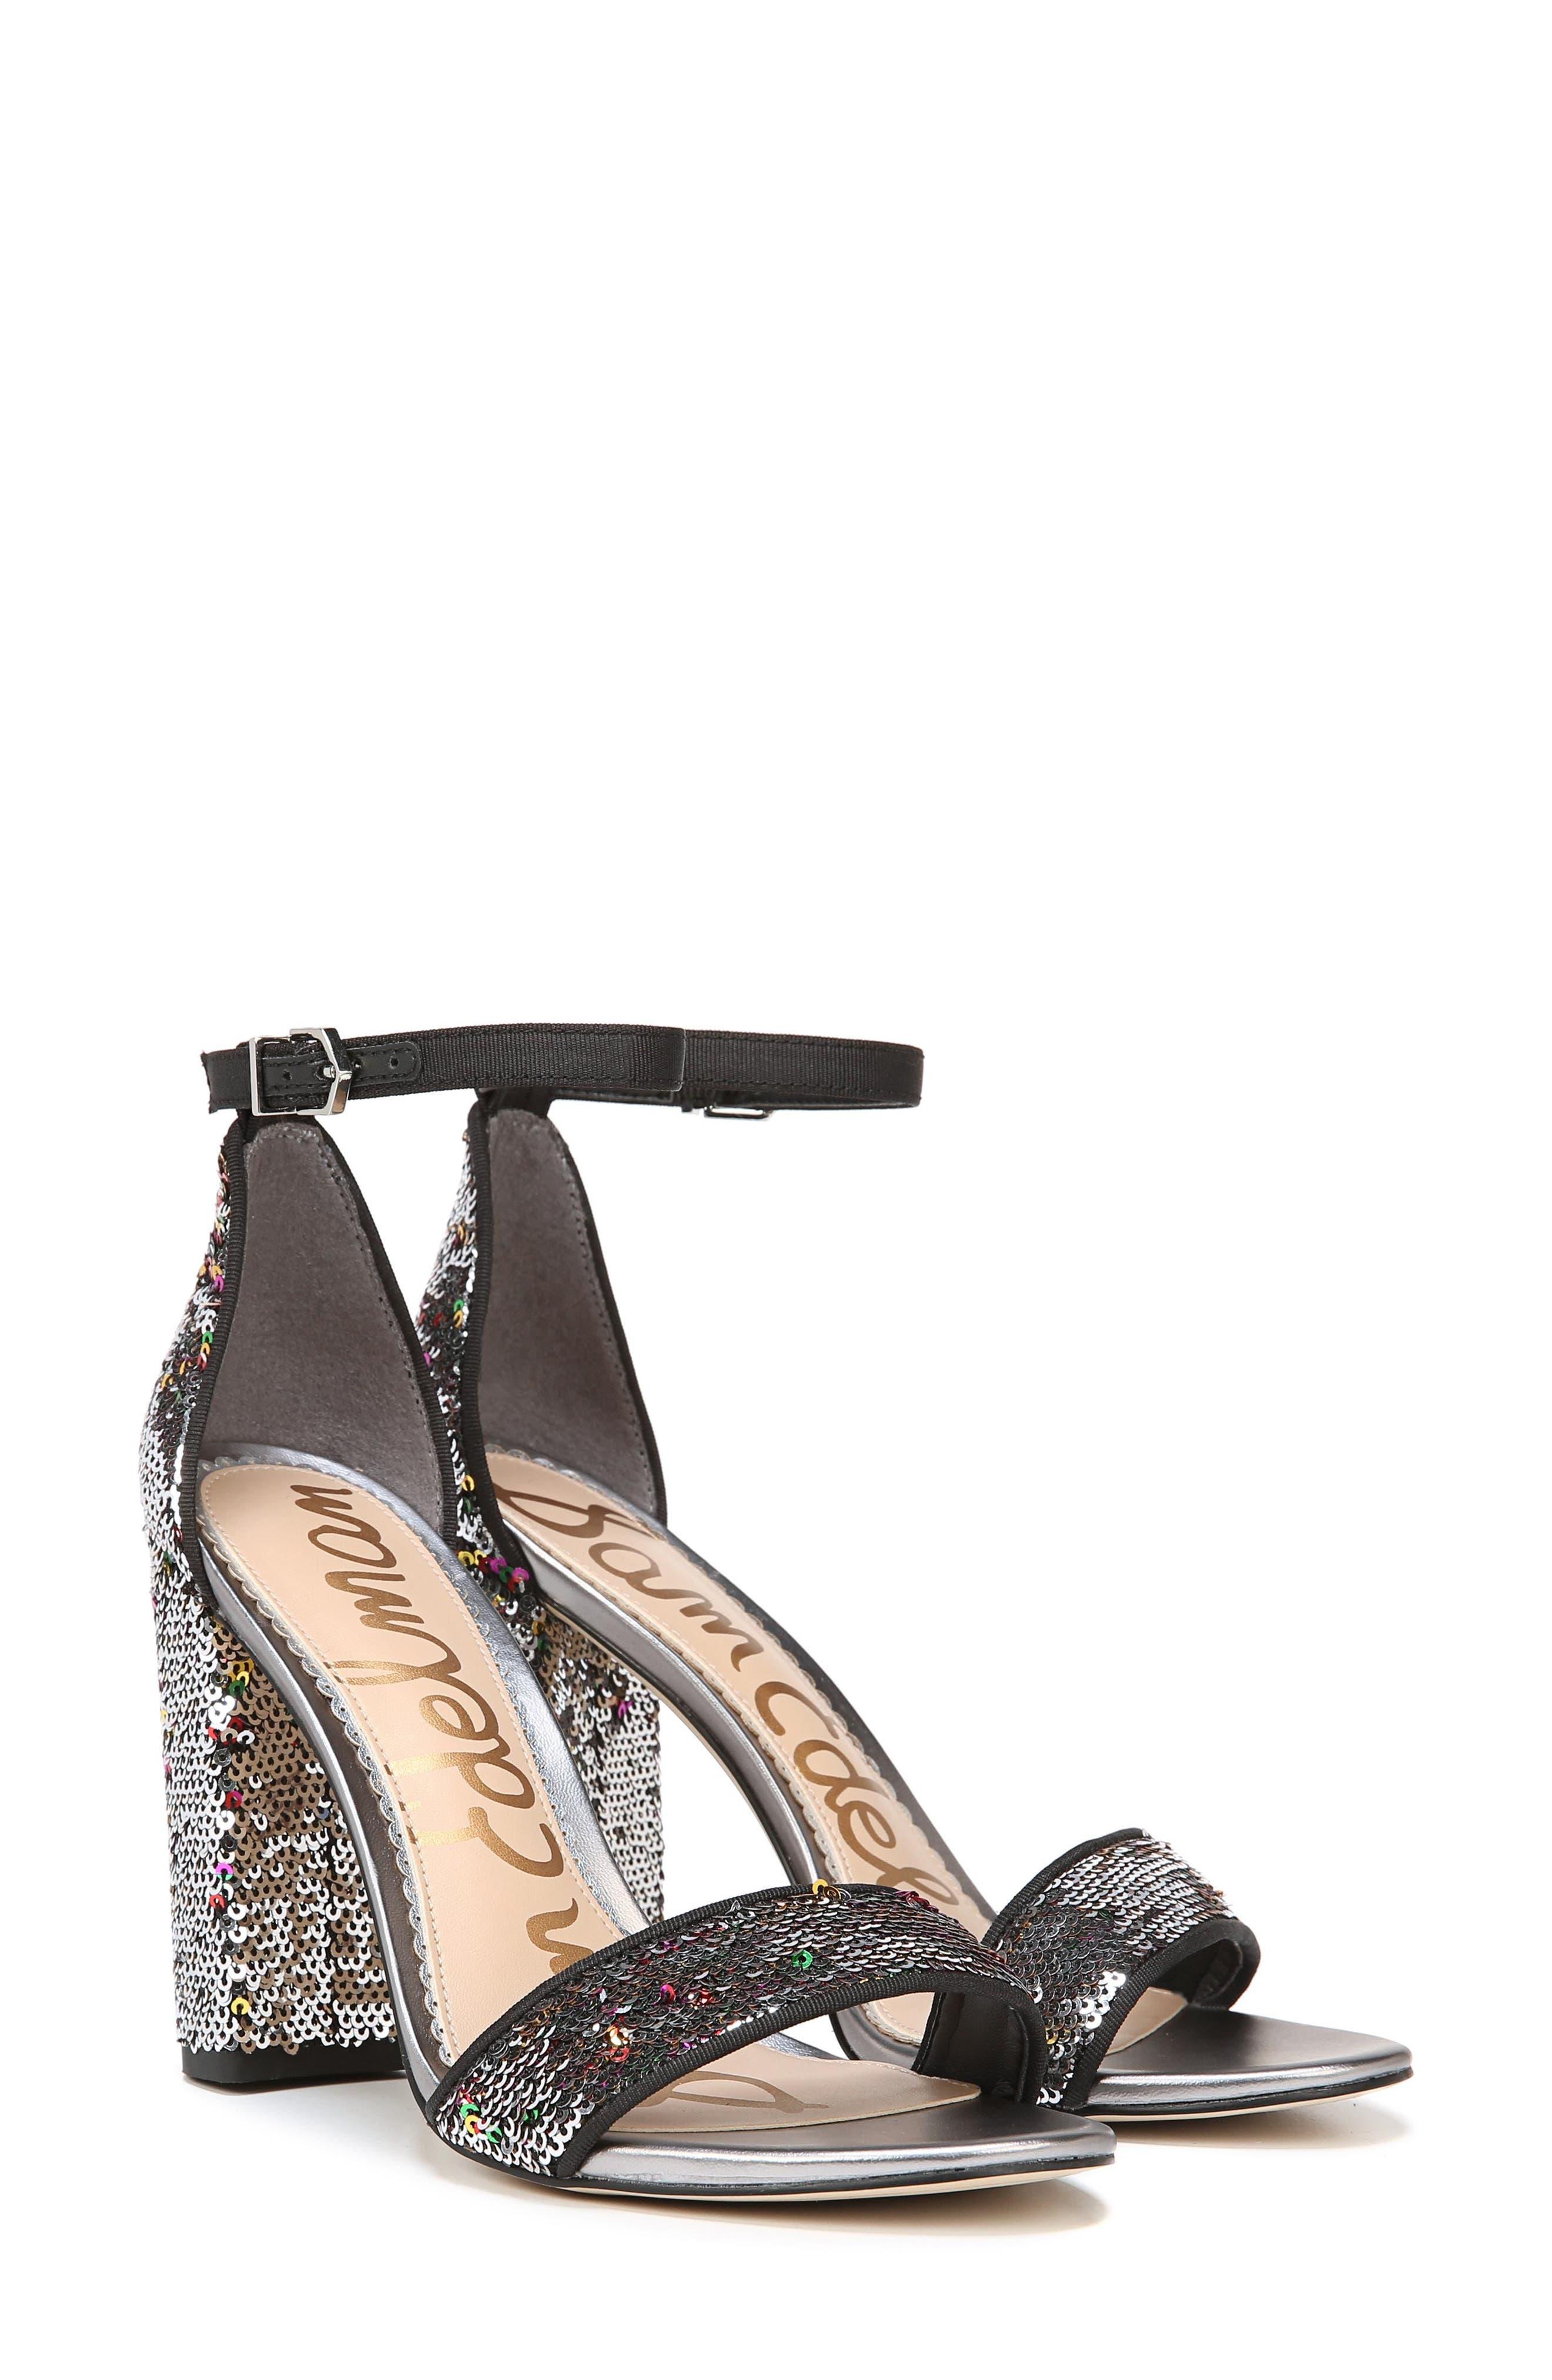 Image of Sam Edelman Yaro Ankle Strap Sandal